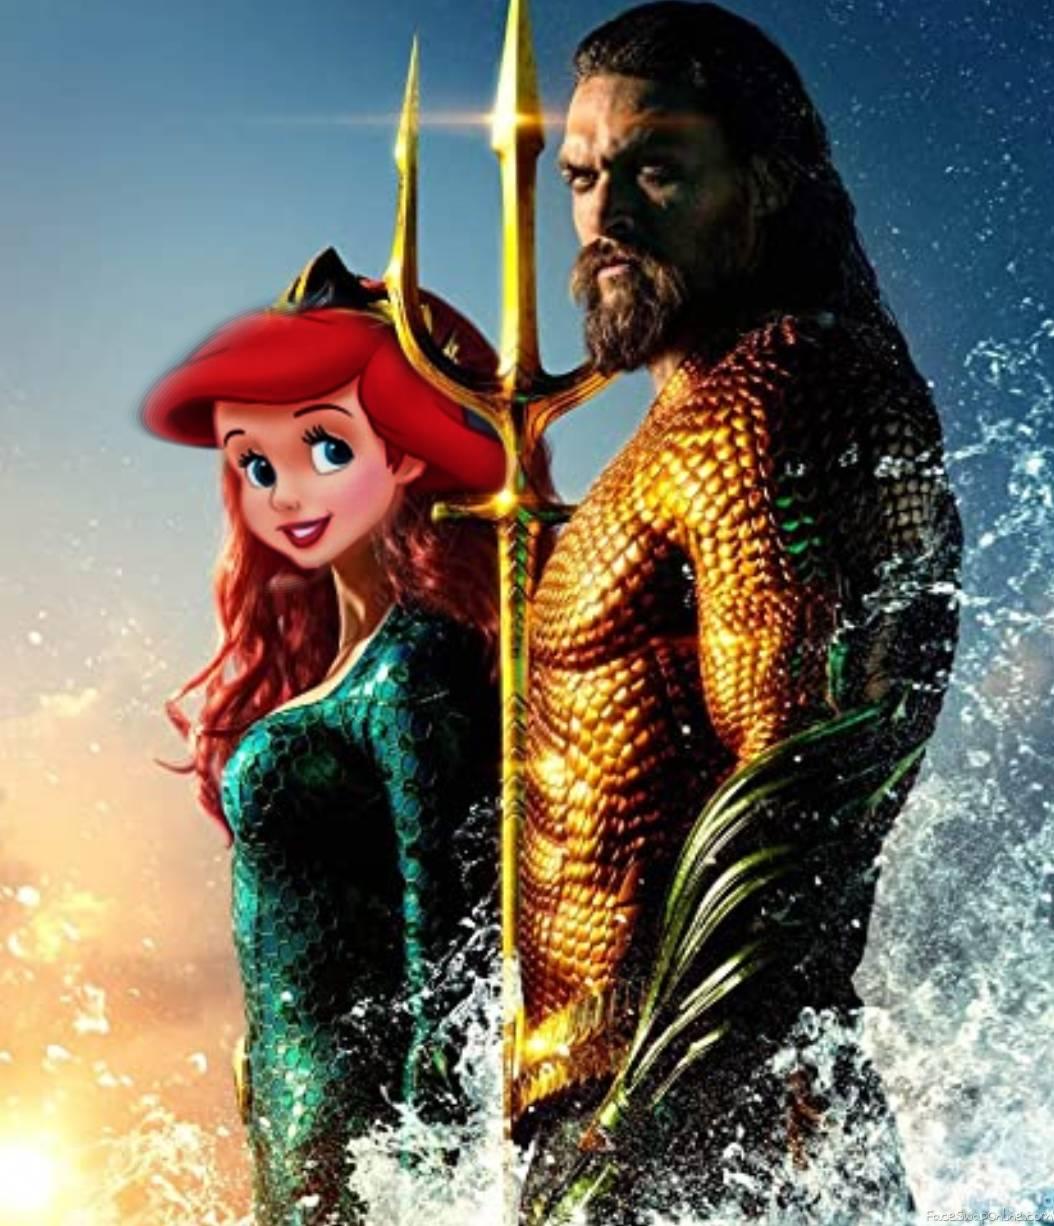 Amber Heard replaced by Mermaid in Aquaman 2